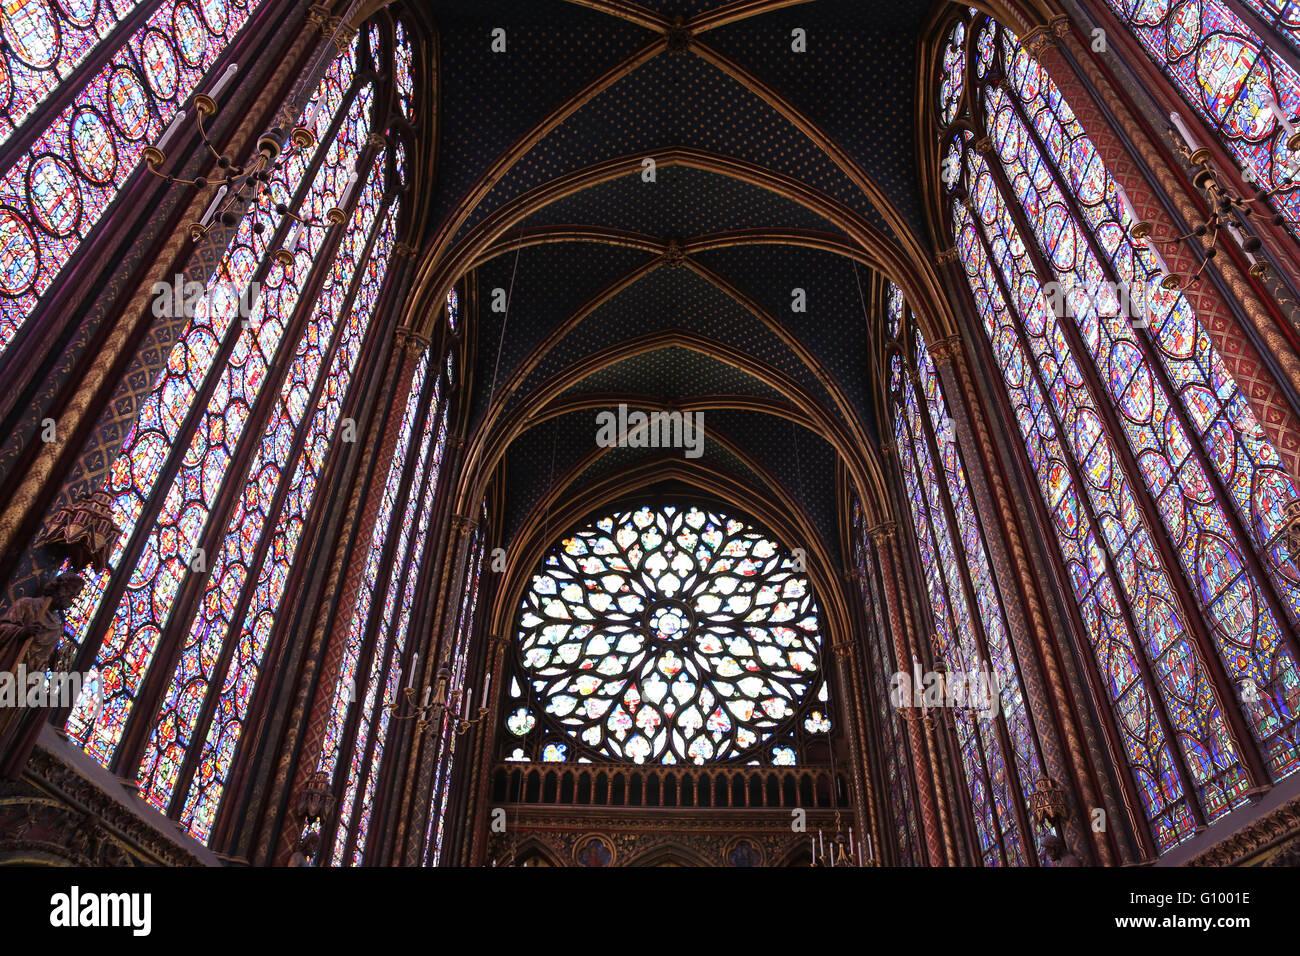 Glasmalerei. Obere Kapelle von La Sainte-Chapelle (die Heilige Kapelle). 1248. Paris. Frankreich. Gothic. Stockbild